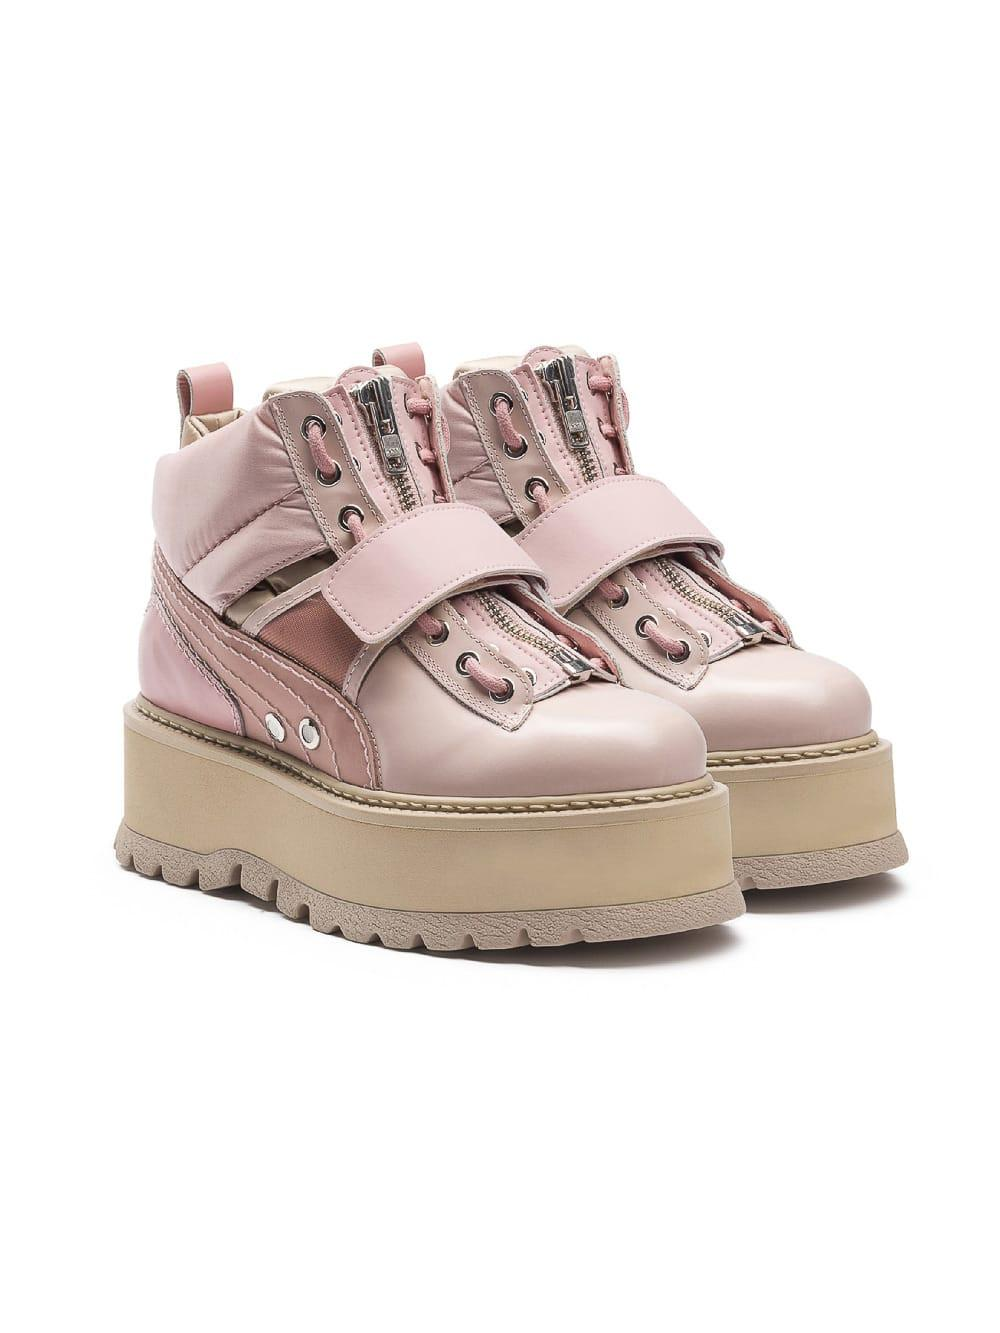 99d02f871d93 Puma Pink  Fenty X By Rihanna  Sneaker Boots In Silver Pink